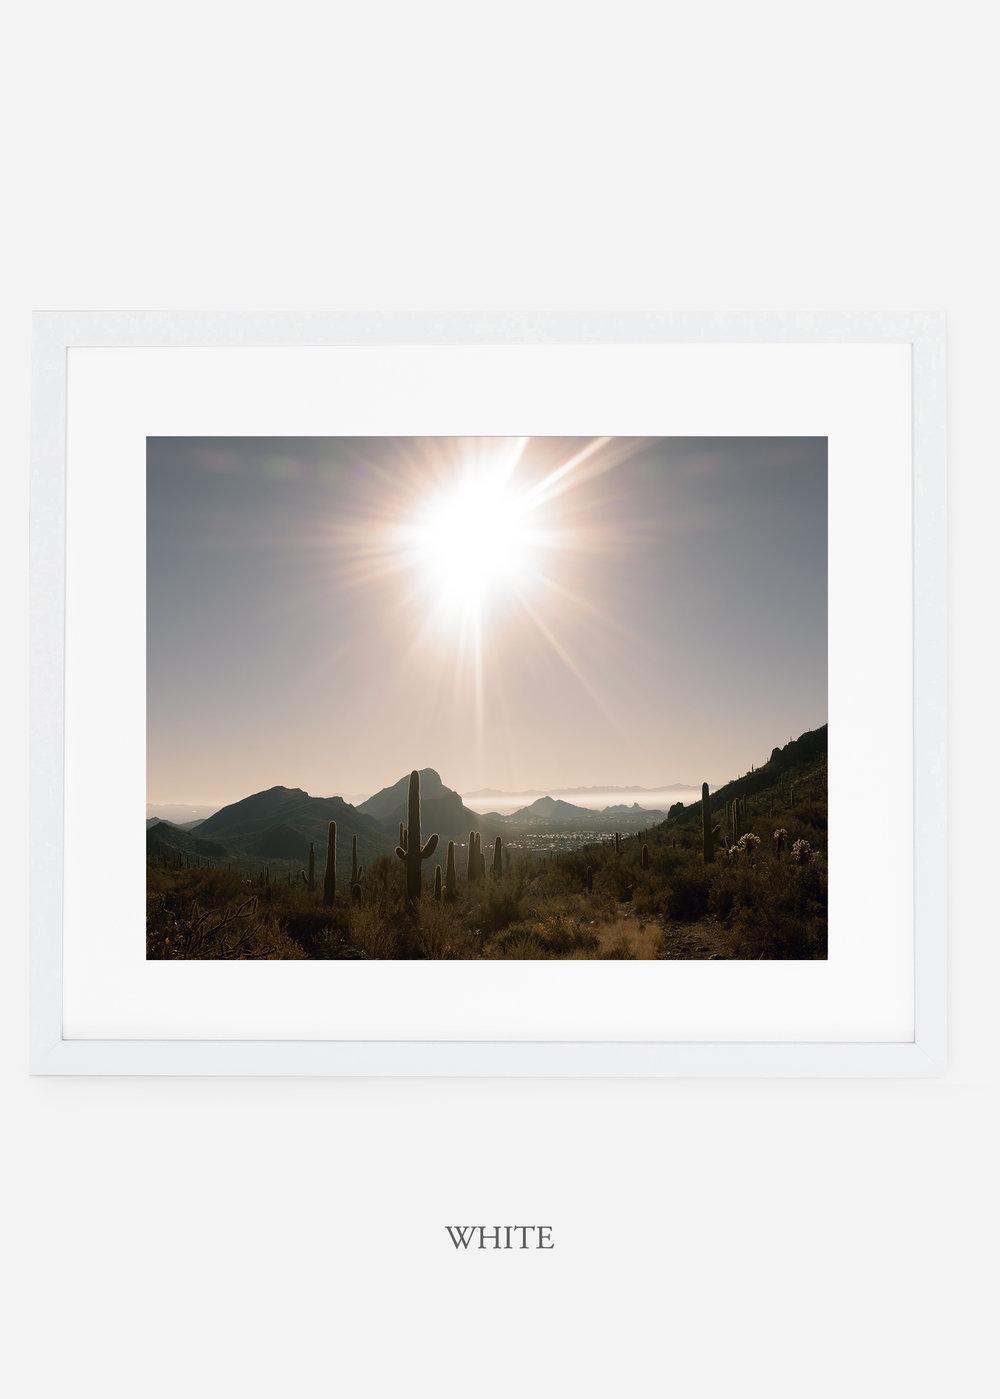 whiteframe-saguaroNo.15-wildercalifornia-art-wallart-cactusprint-homedecor-prints-arizona-botanical-artwork-interiordesign.jpg